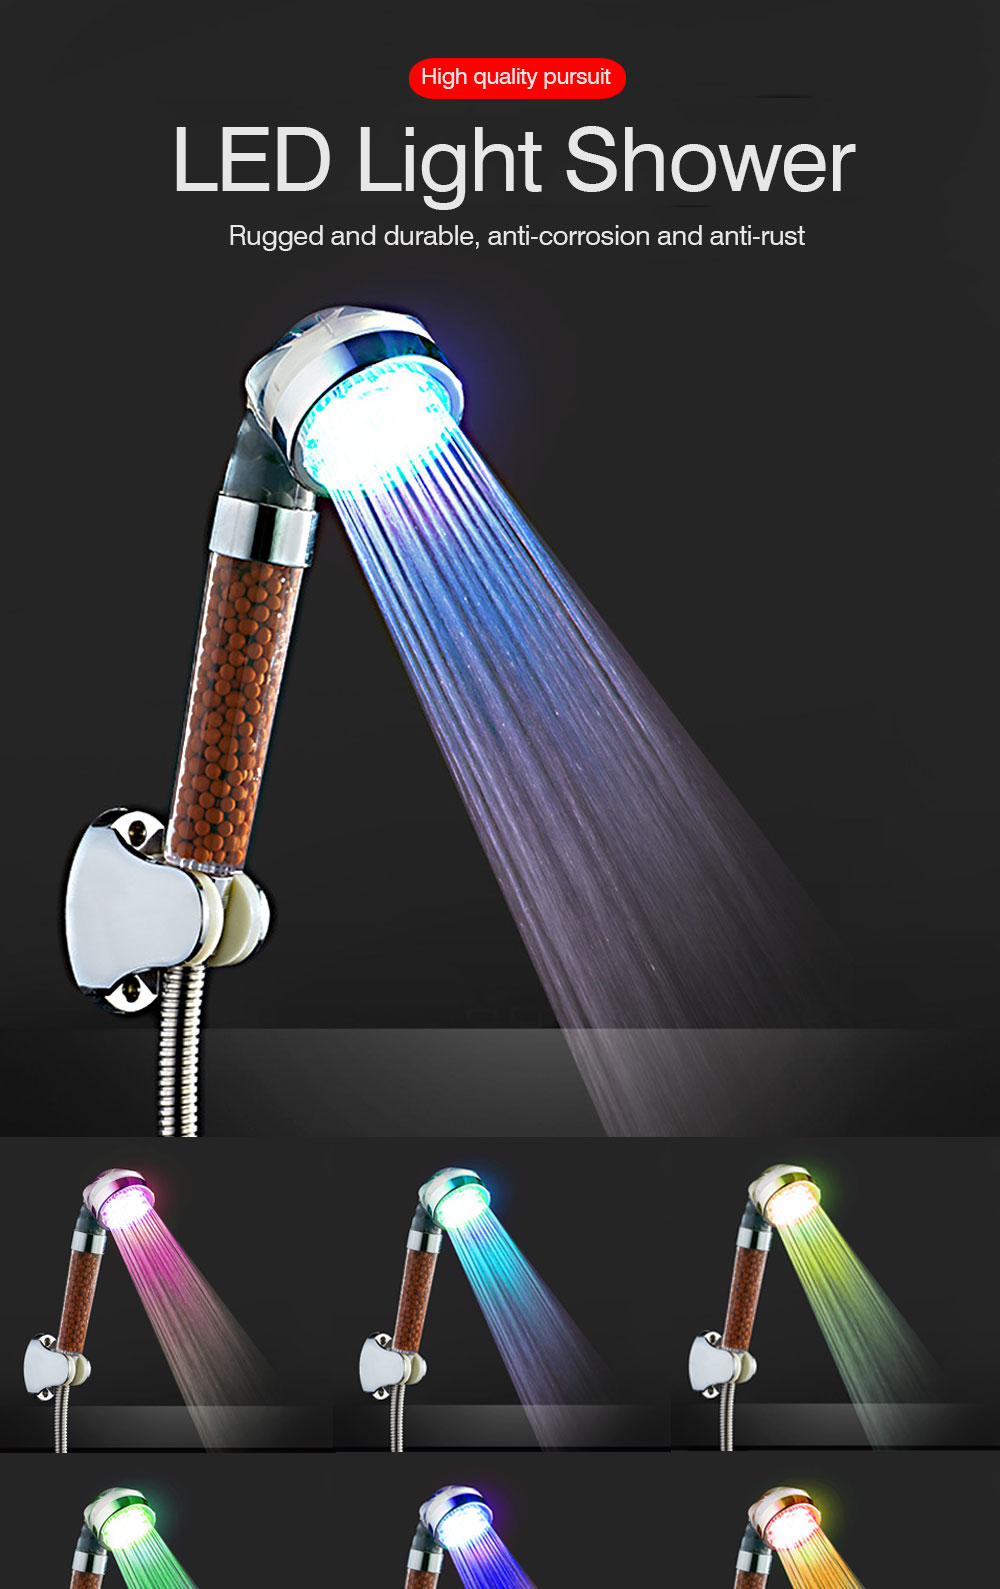 LED Shower Head Pressurized rain Shower head Colorful Led Water Saving High